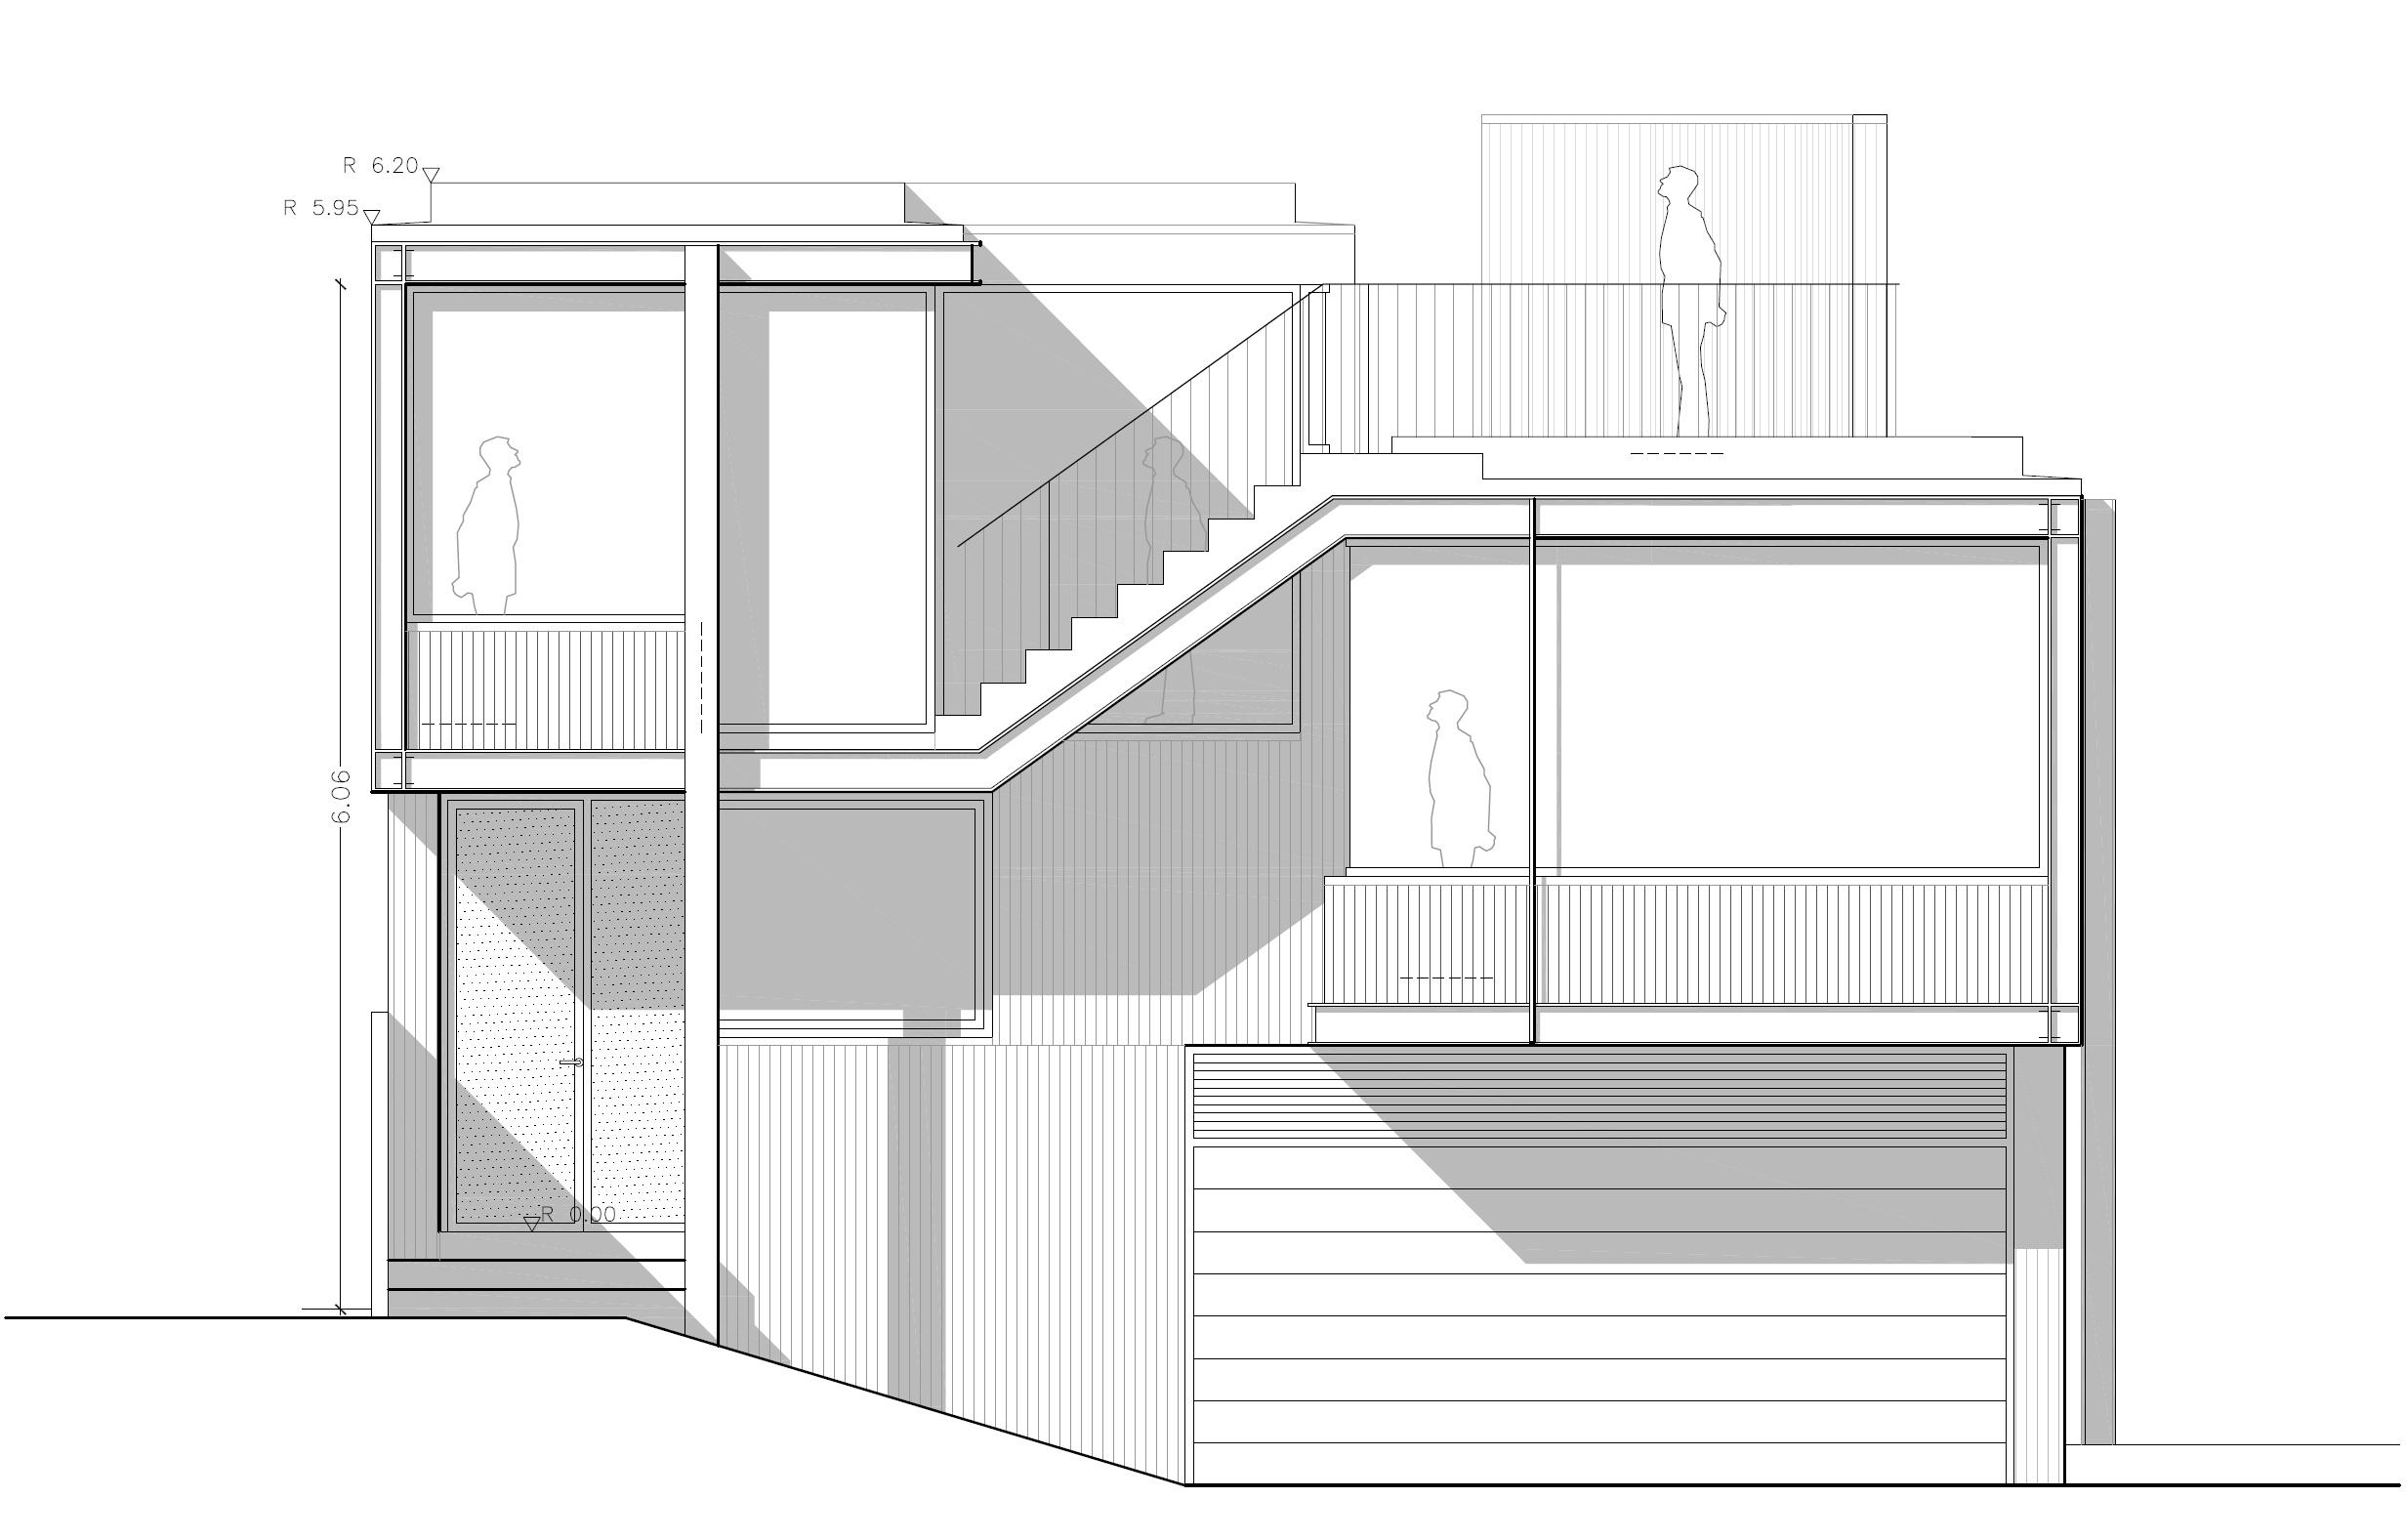 Anteproyecto de vivienda unifamiliar en s marti o moa a for Estructura arquitectura